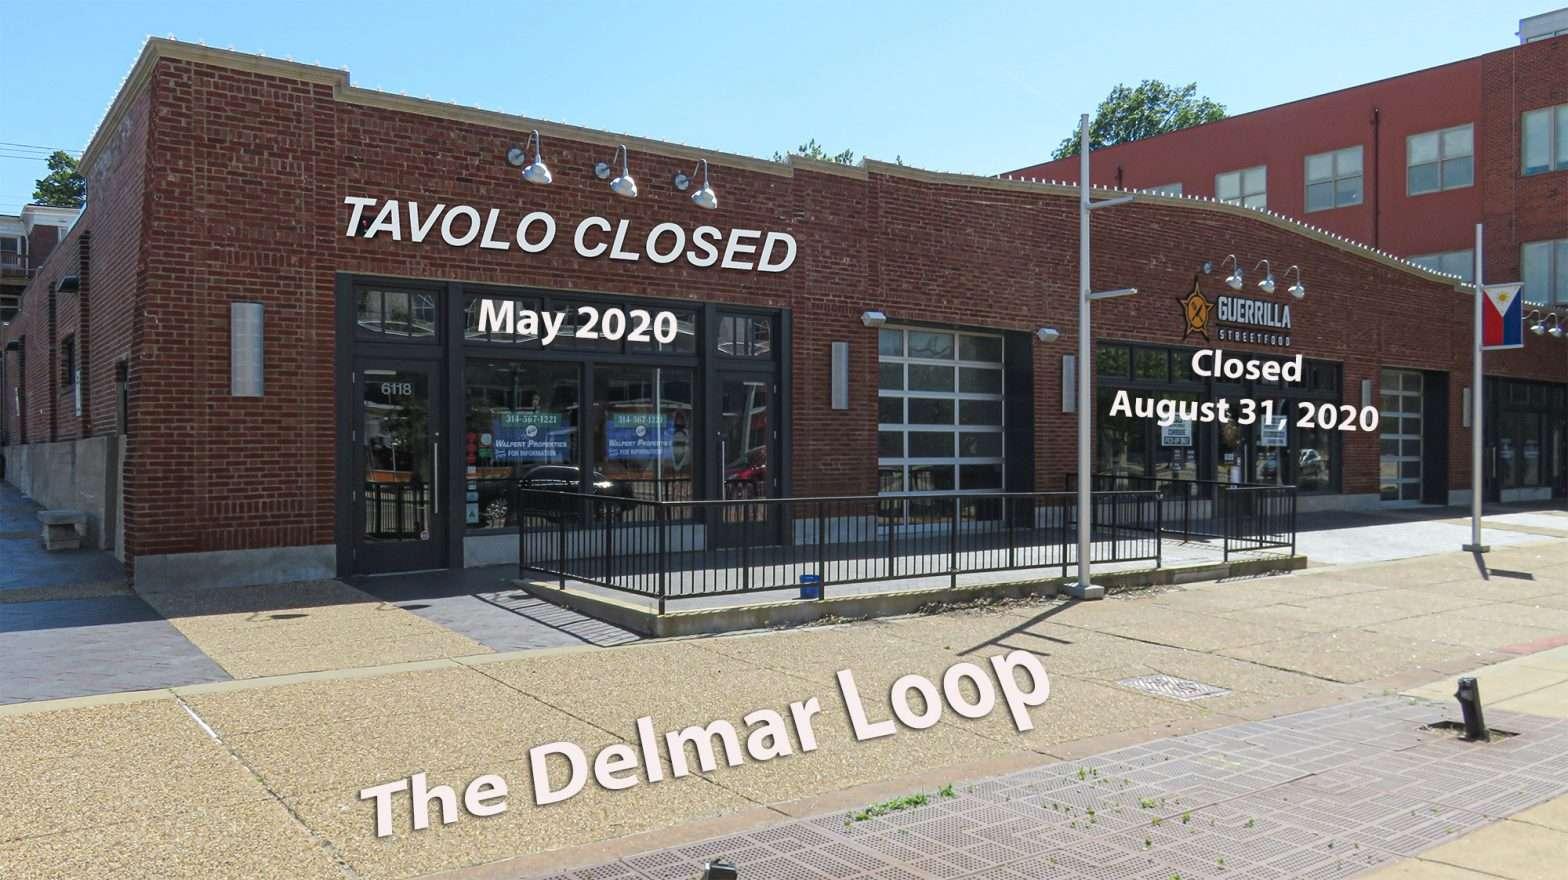 Guerrilla Street Food on The Delmar Loop Closes Permanently